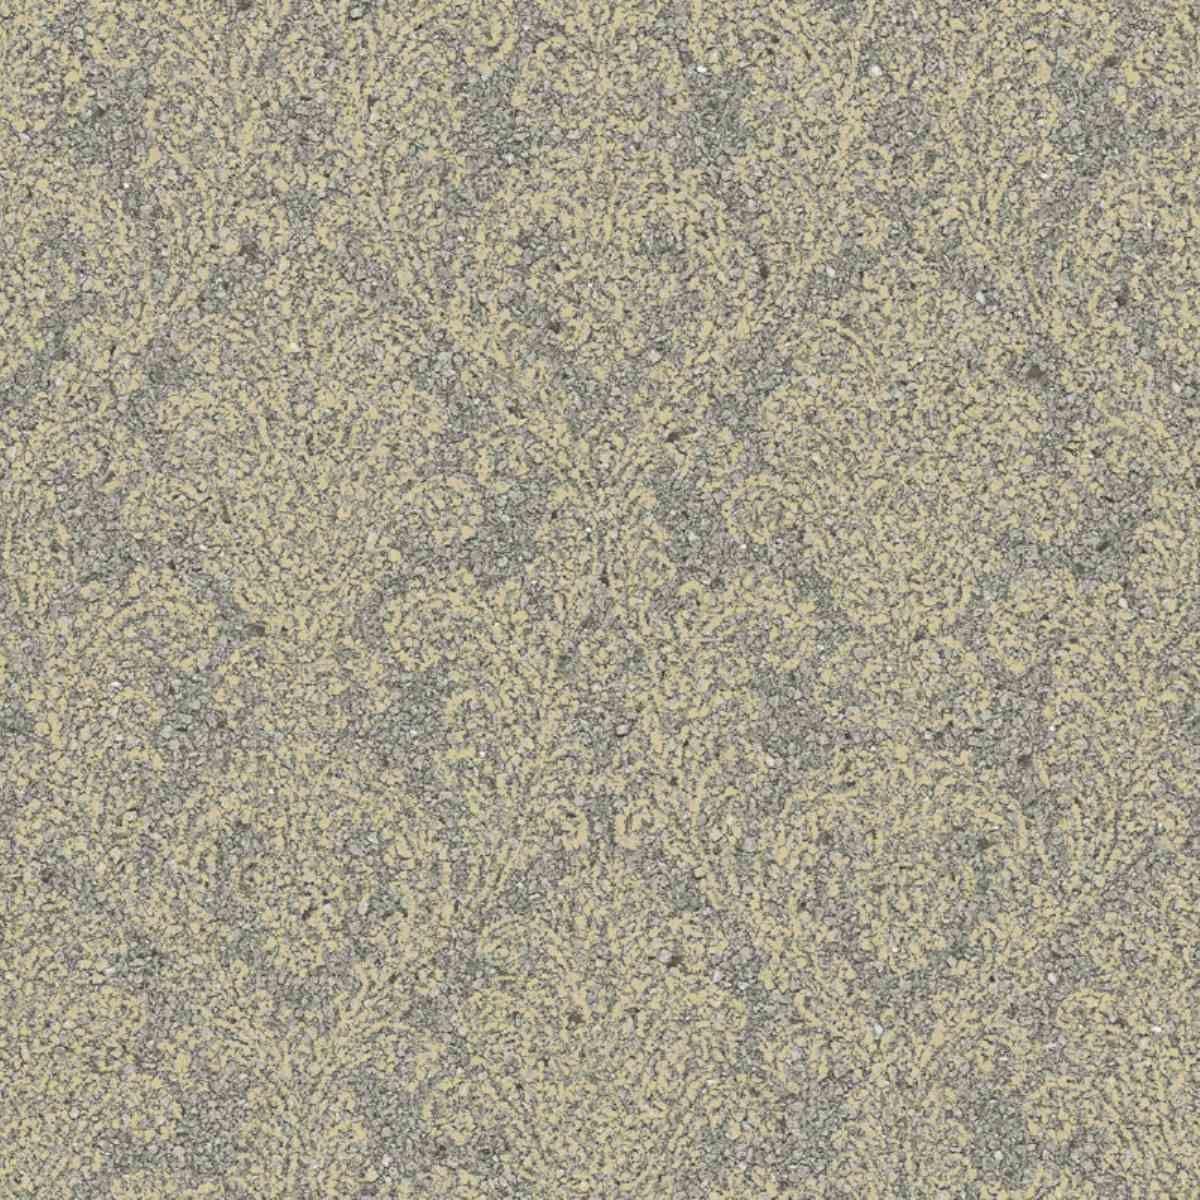 serendipity 2 classic damask natural - mica cork silk wall paper beige grey metallic sr210104